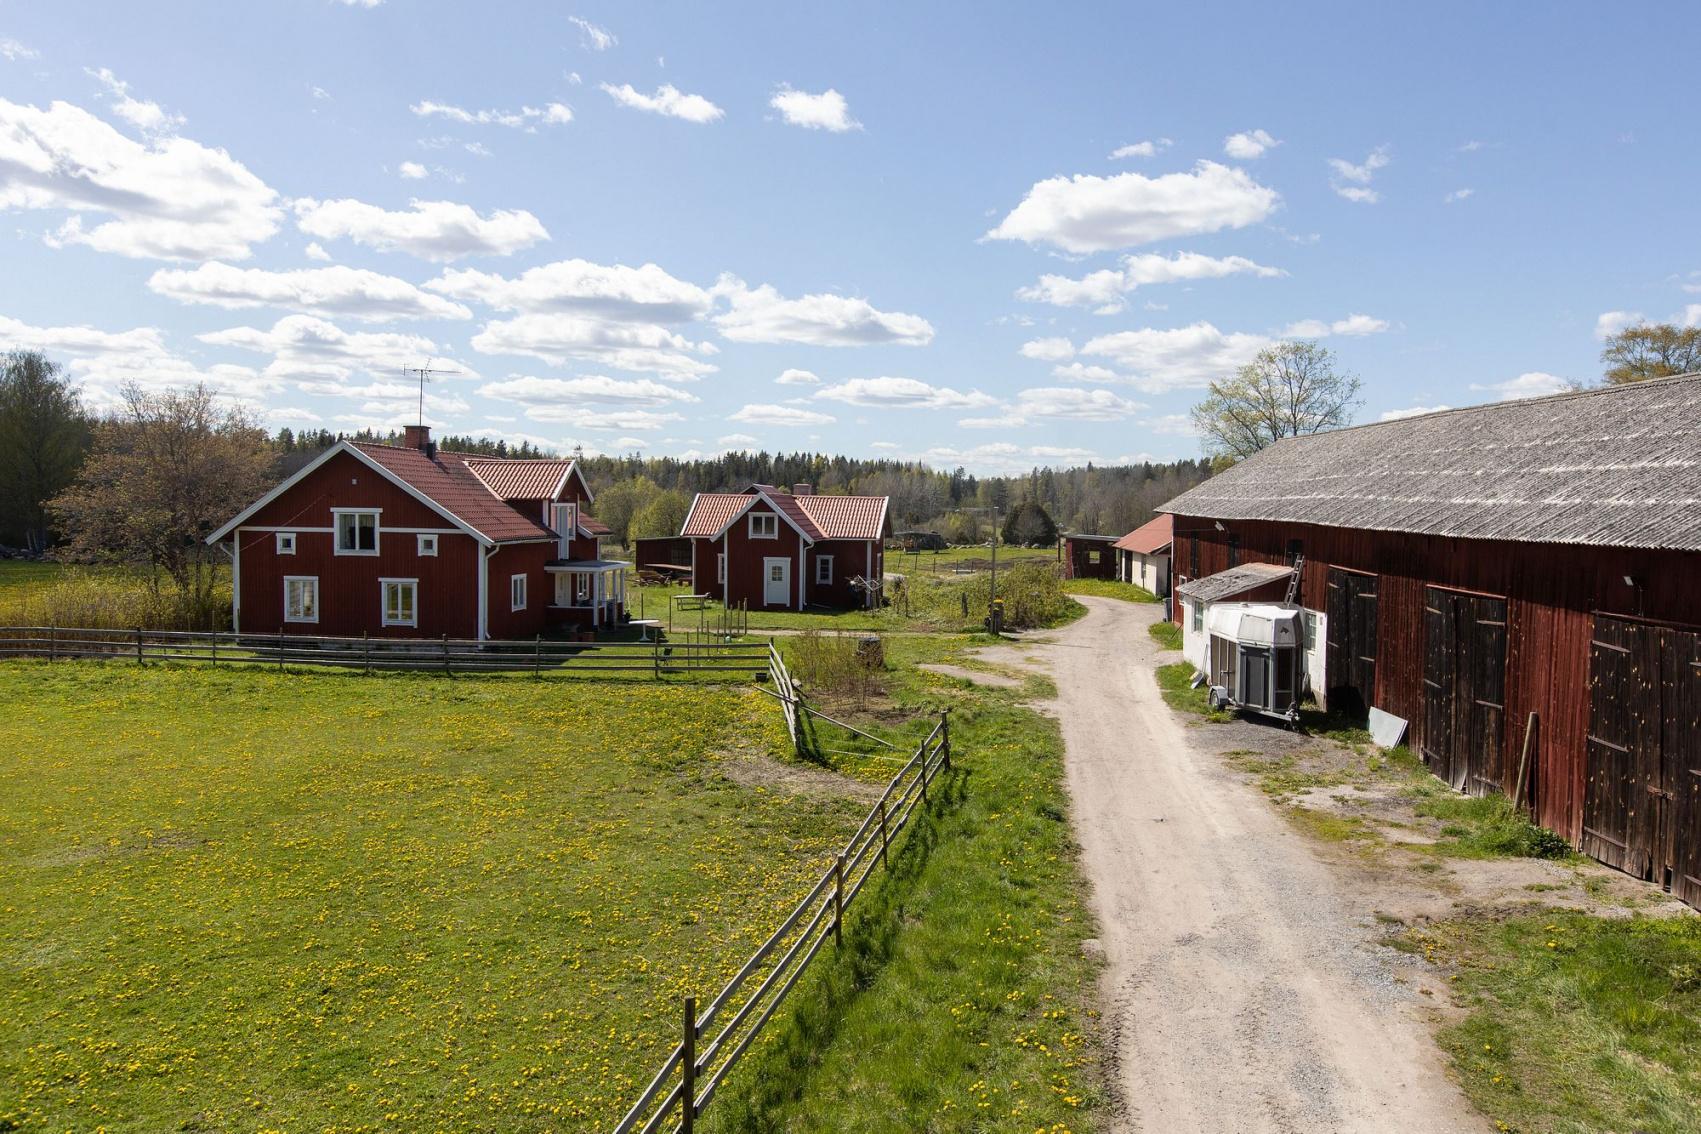 Grd i Smara, Edsbro - Carlsson Ring